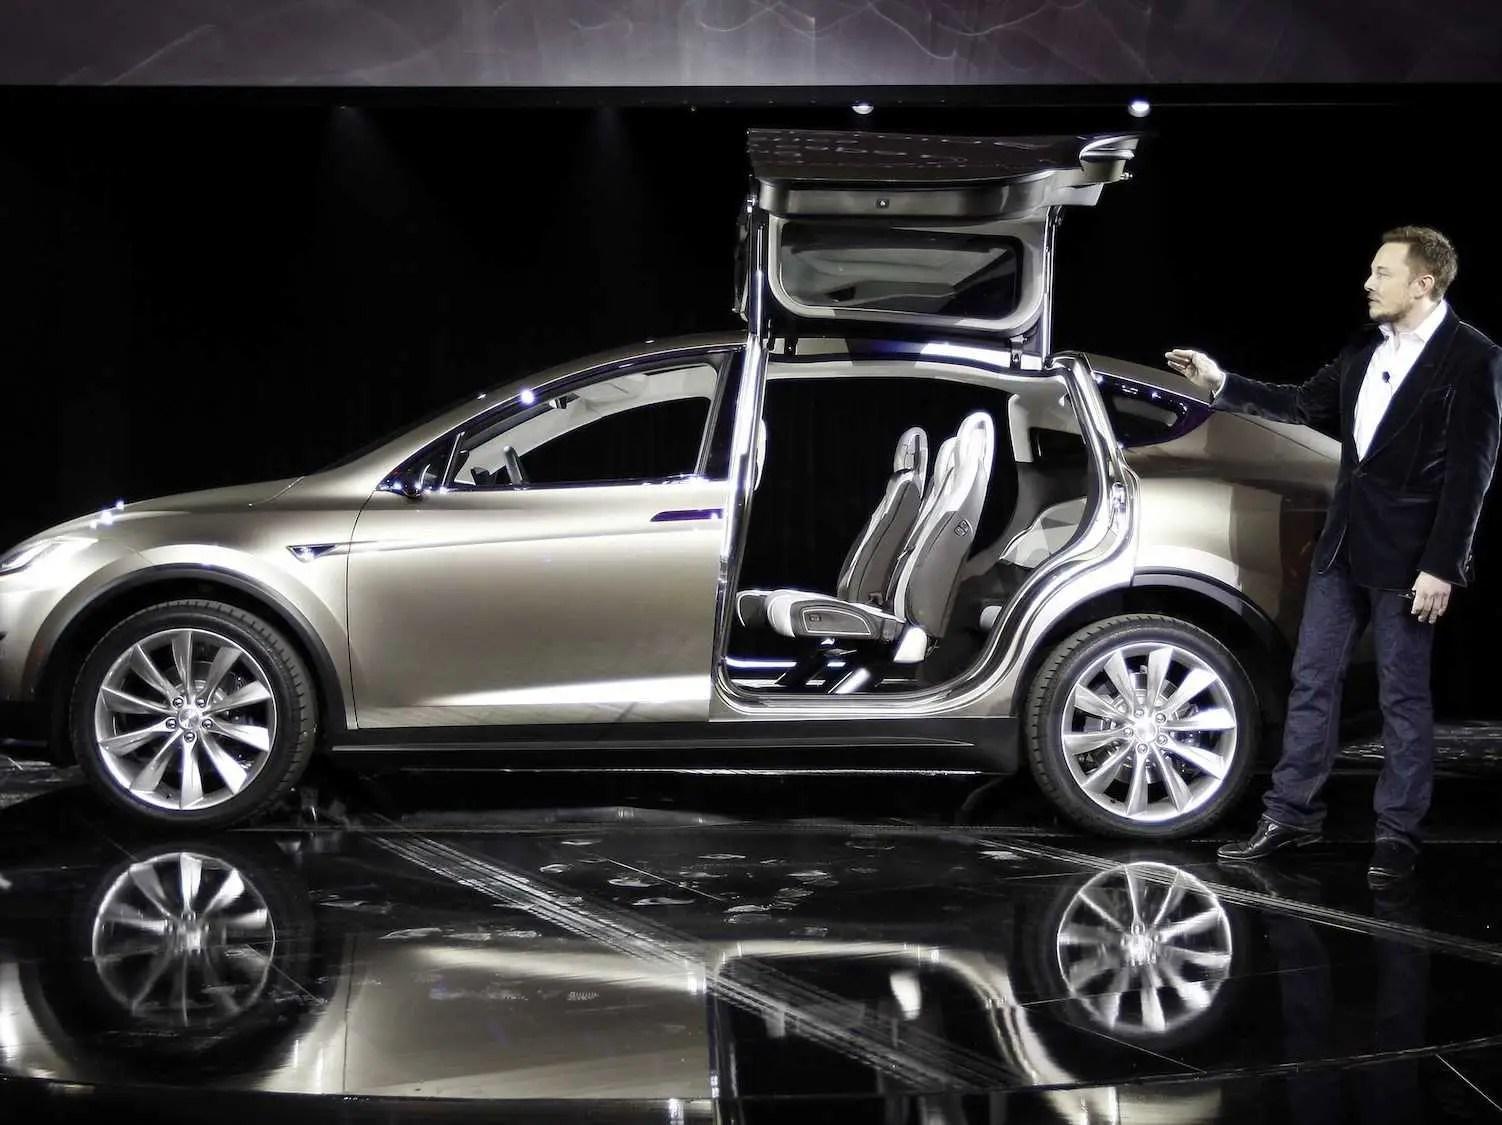 https://i2.wp.com/static5.businessinsider.com/image/530610acecad049d0316d24c/elon-musk-teslas-suv-will-be-more-popular-than-the-model-s-sedan.jpg